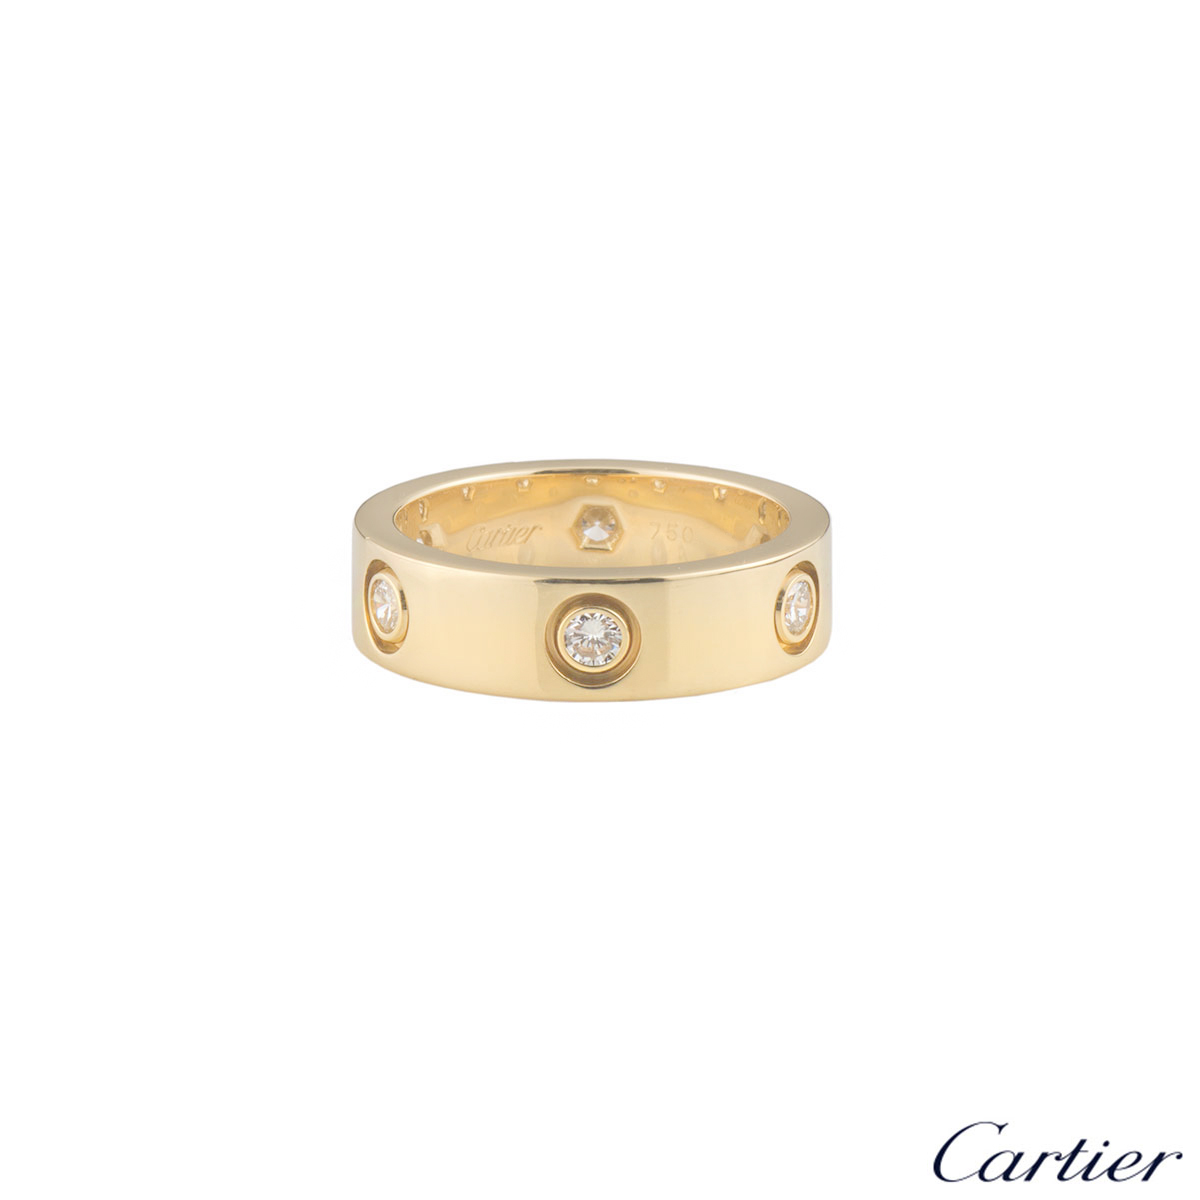 CartierYellow Gold Full Diamond Love Ring Size 56 B4025956